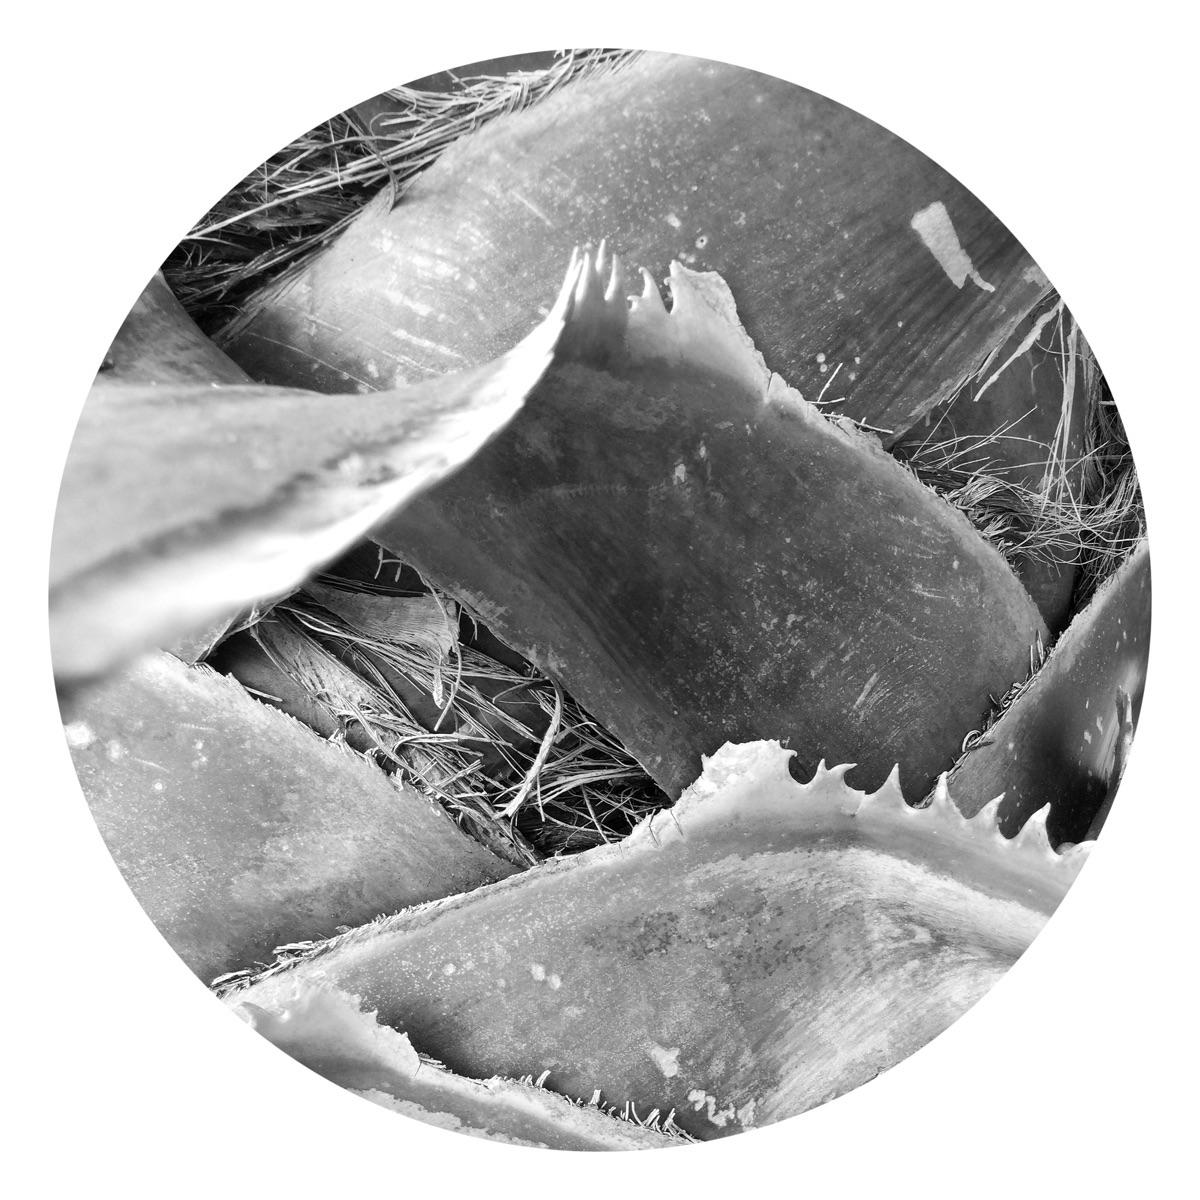 Palm Tree Teeth Apps - mikefl99 - mikefl99 | ello